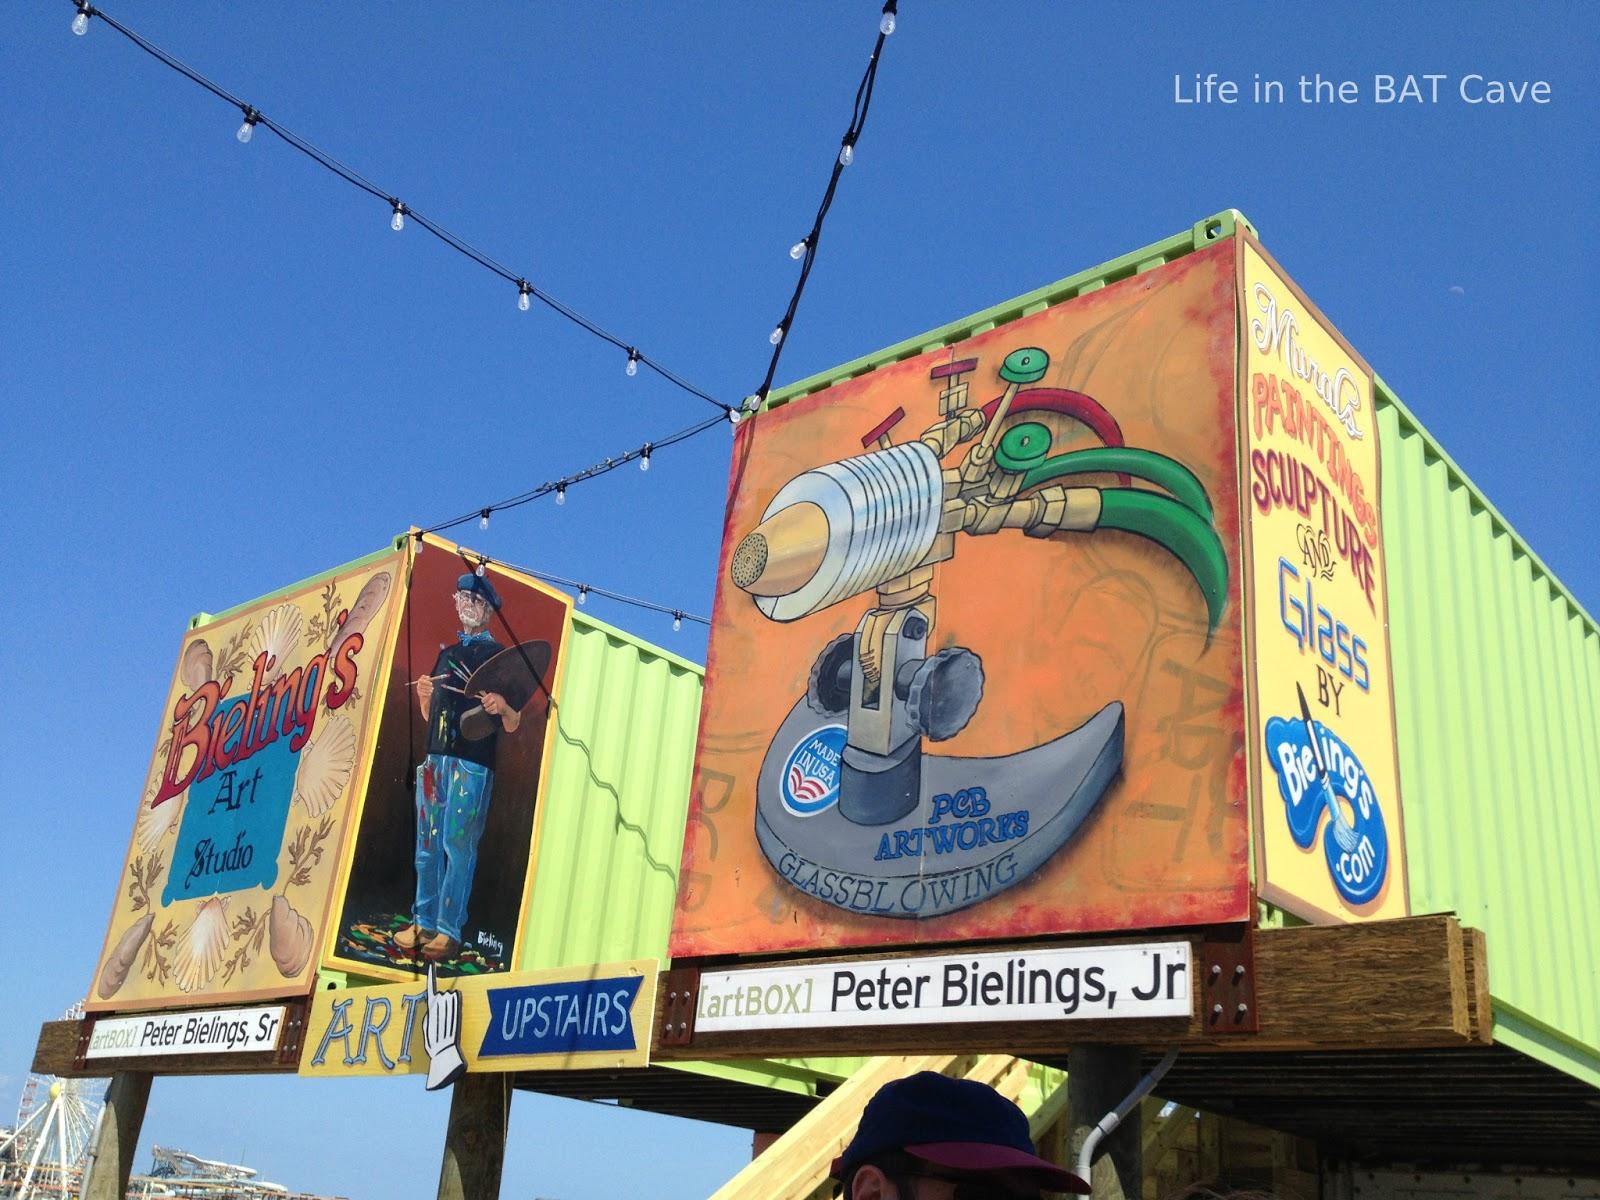 artbox, Adventure Pier, Morey's Piers, Wildwood Boardwalk